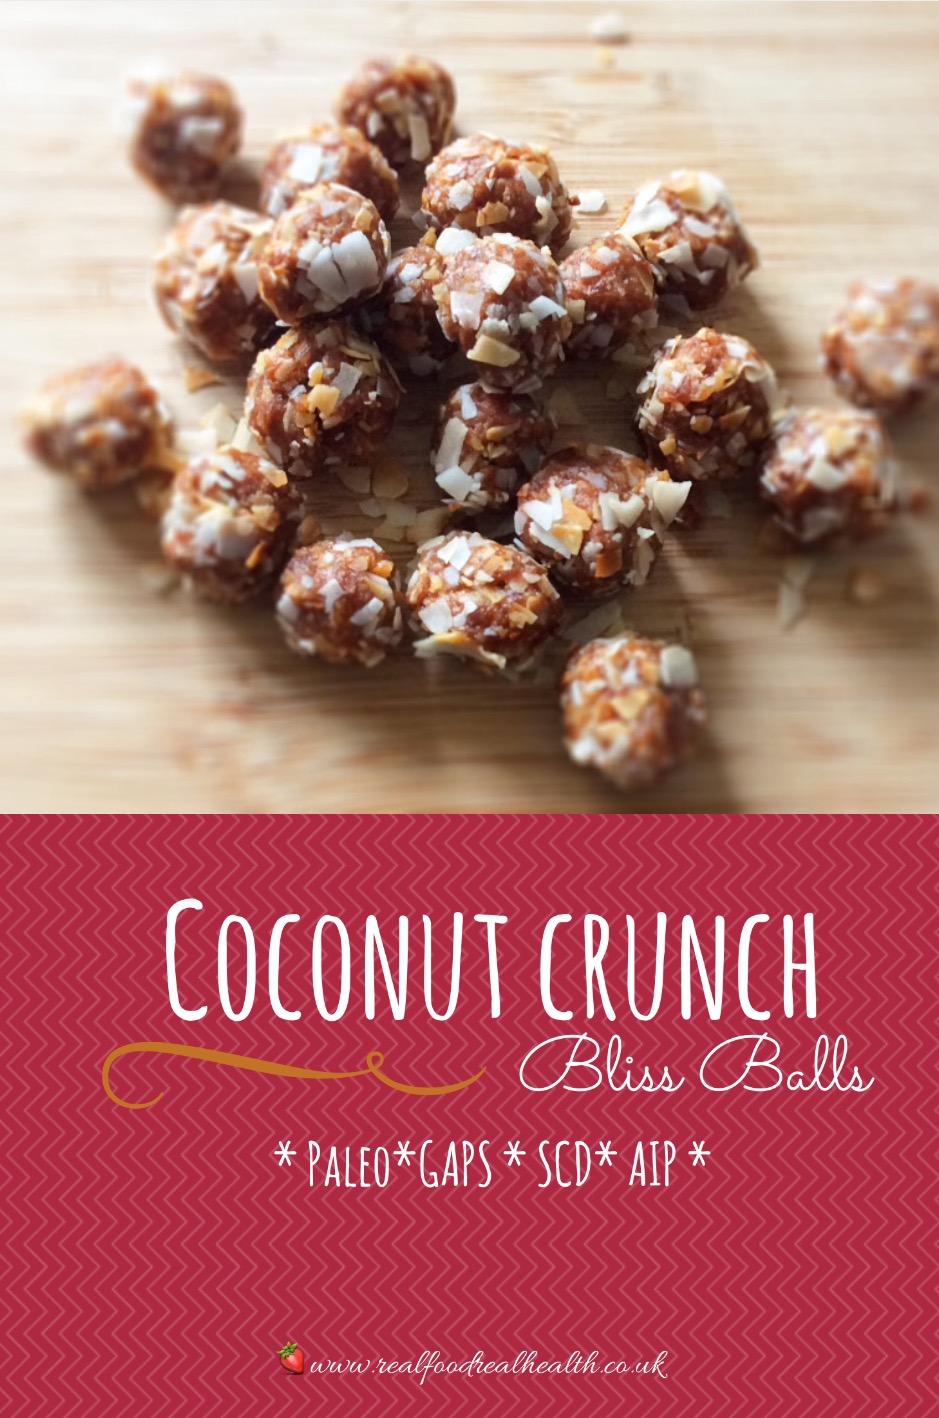 Coconut Crunch Bliss Balls